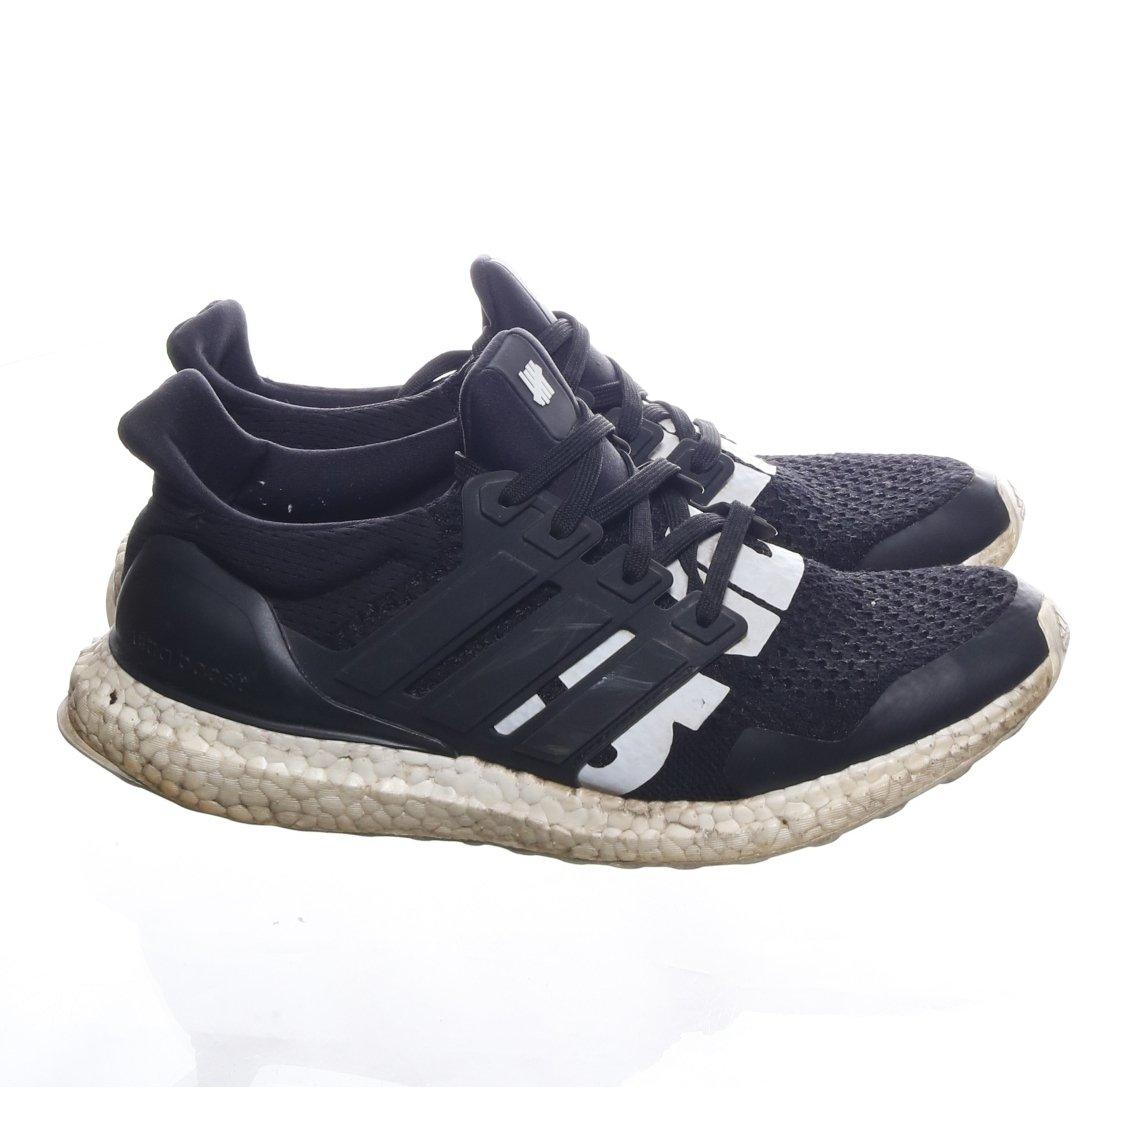 Adidas, Sneakers, Strl: 42, Ultra Boost Adidas x Undefeated, Svart